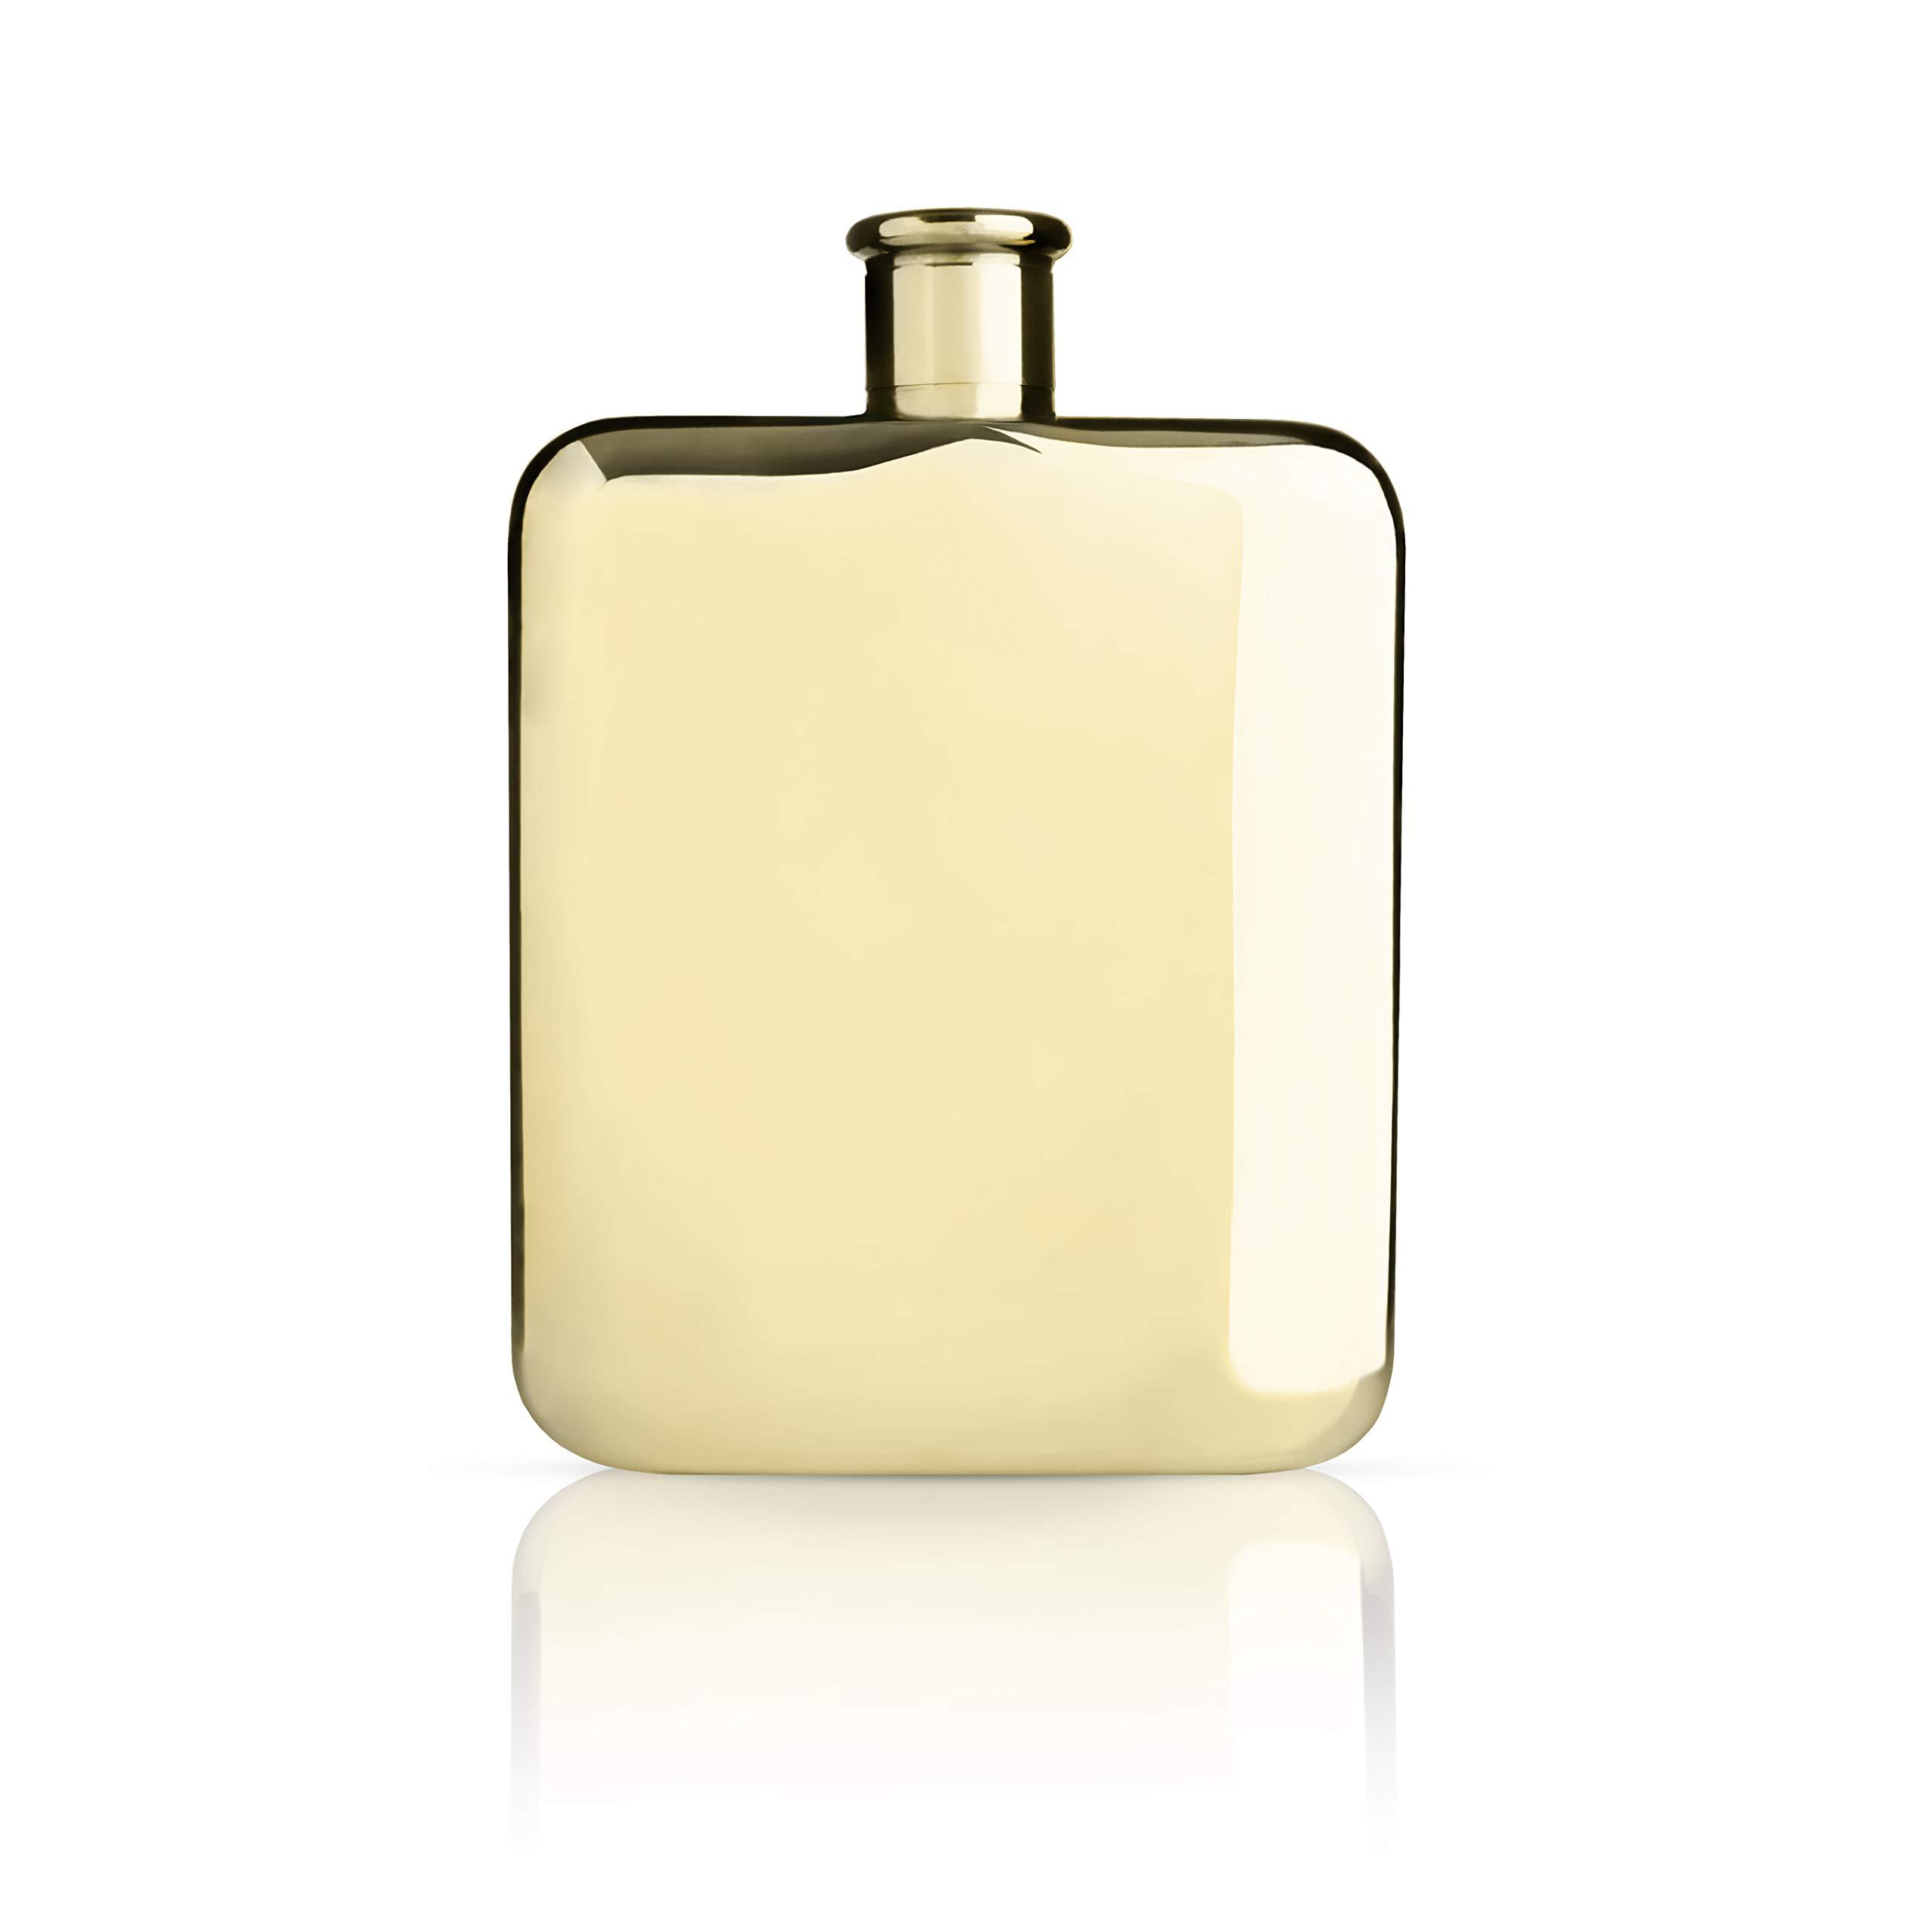 Viski 3710 Belmont Plated Flask, 5'' Gold, by Viski